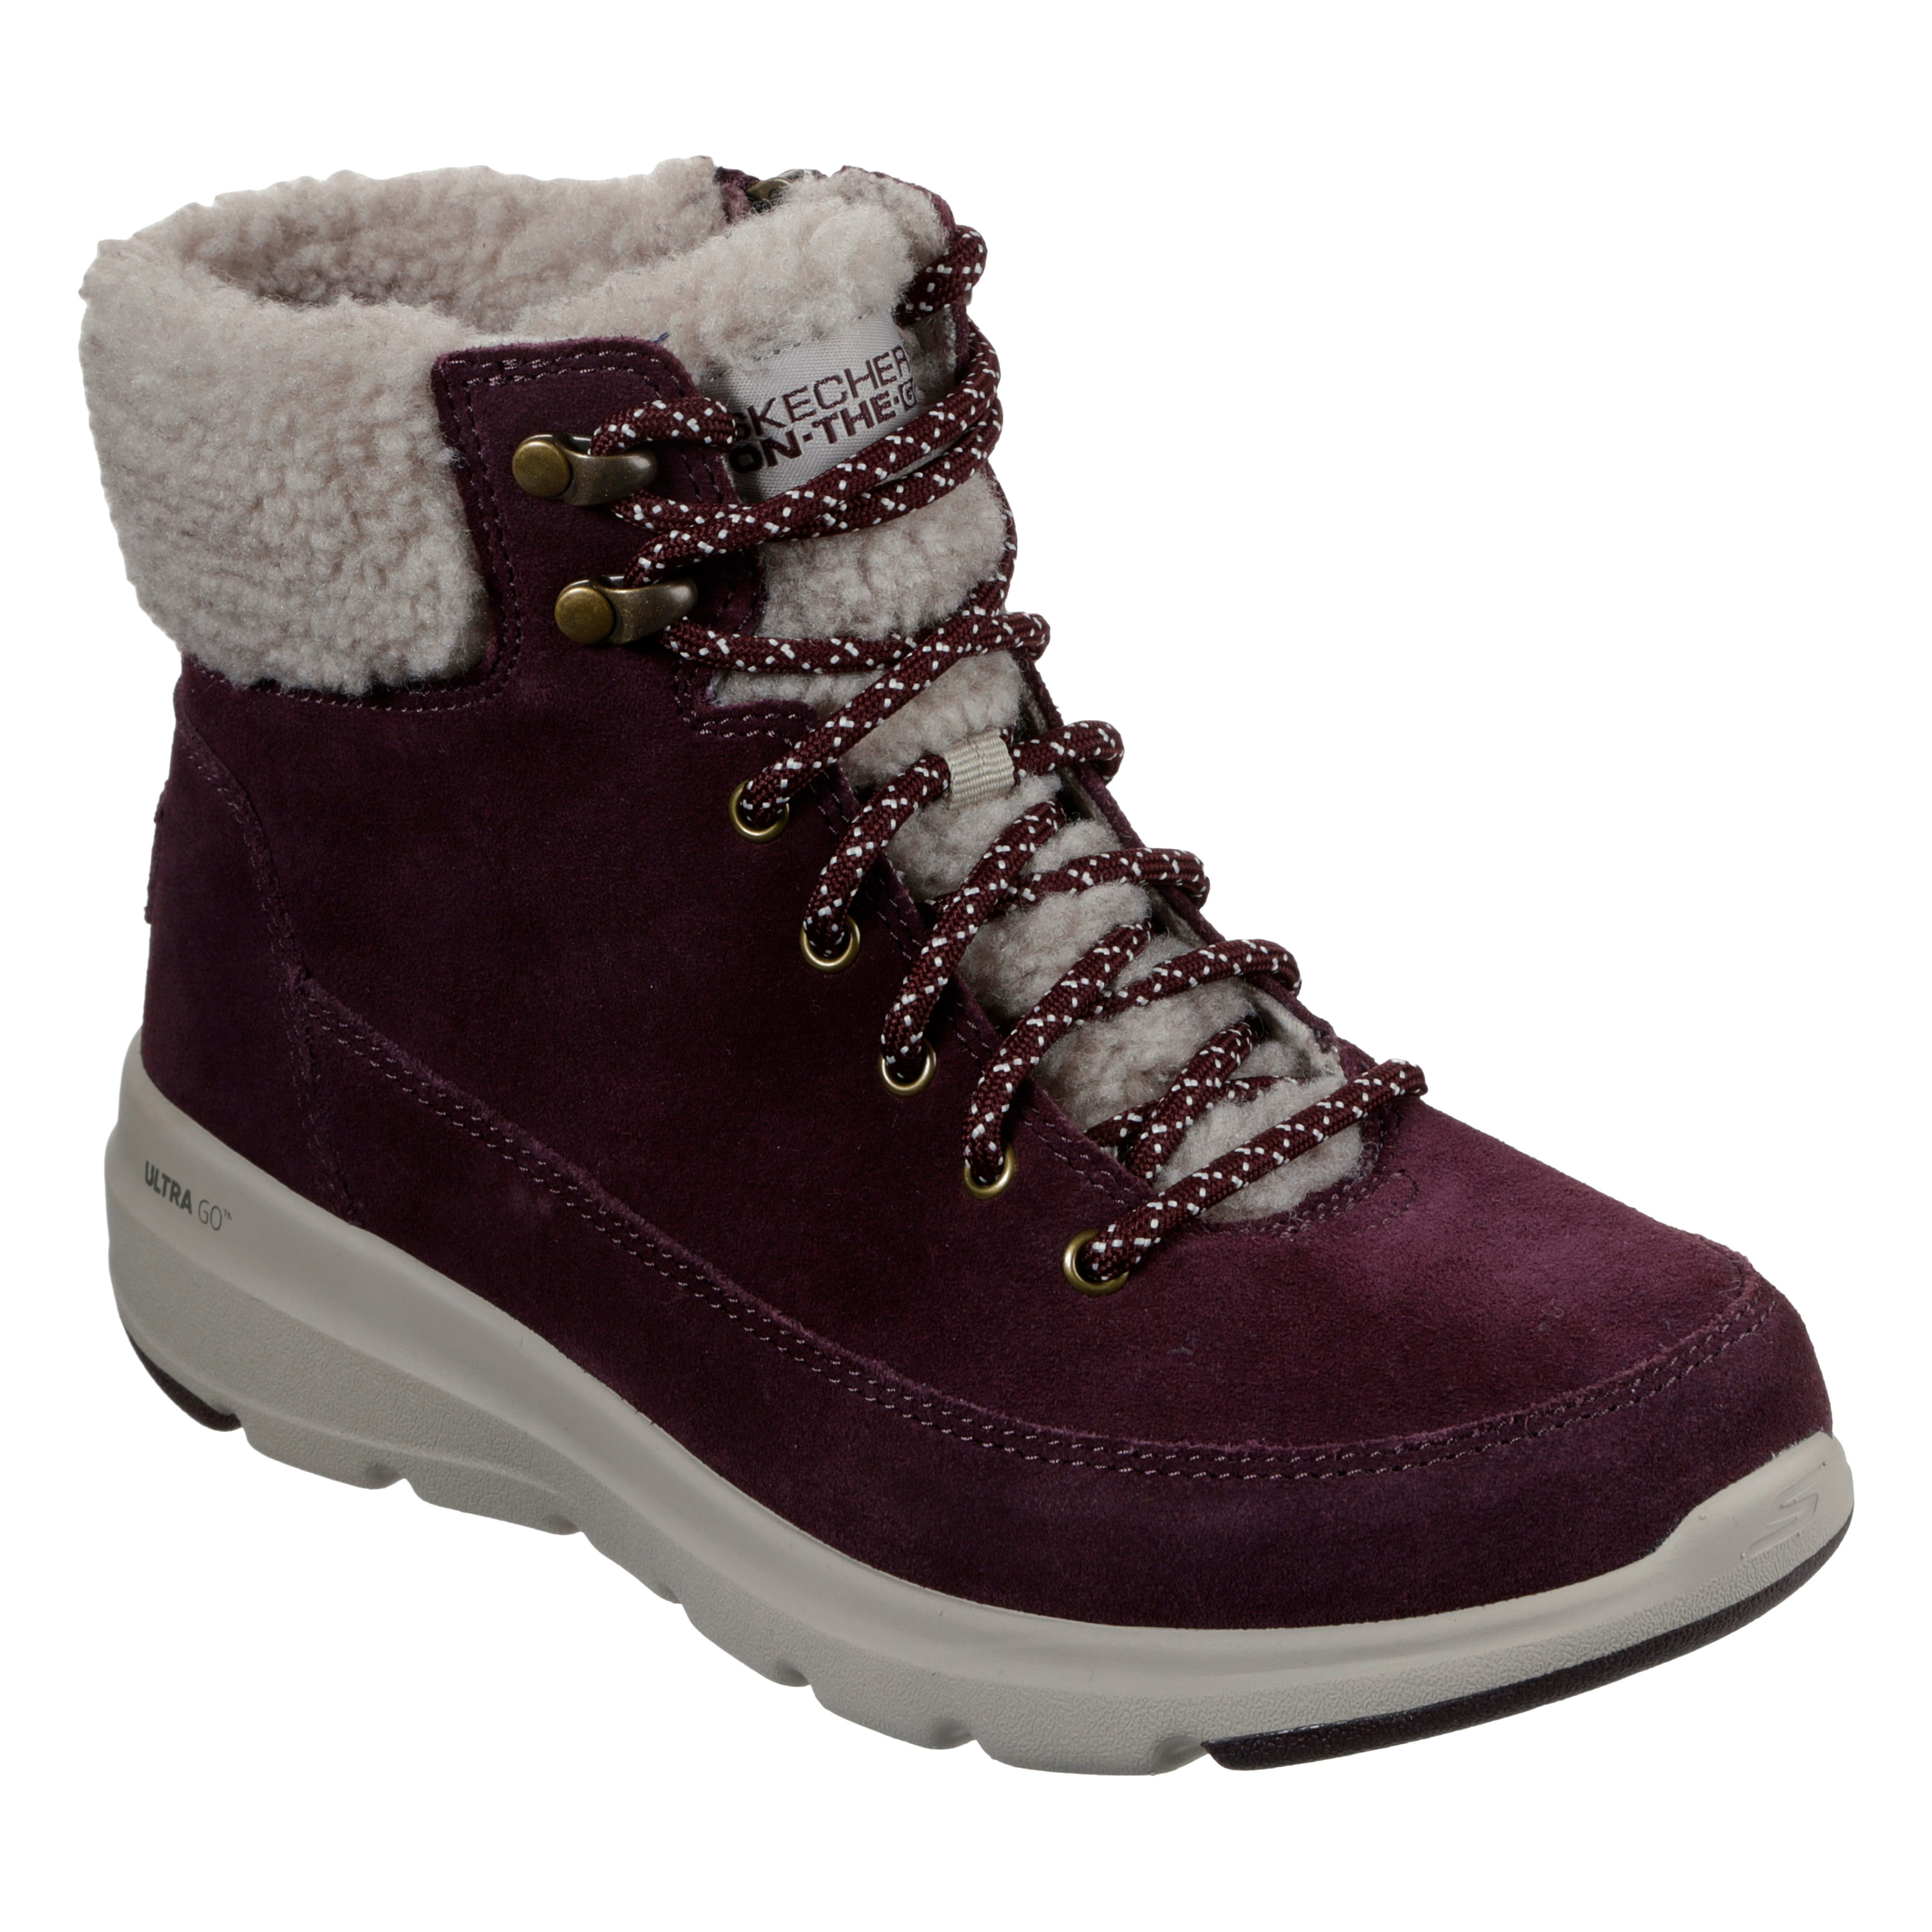 sketcher boots womens